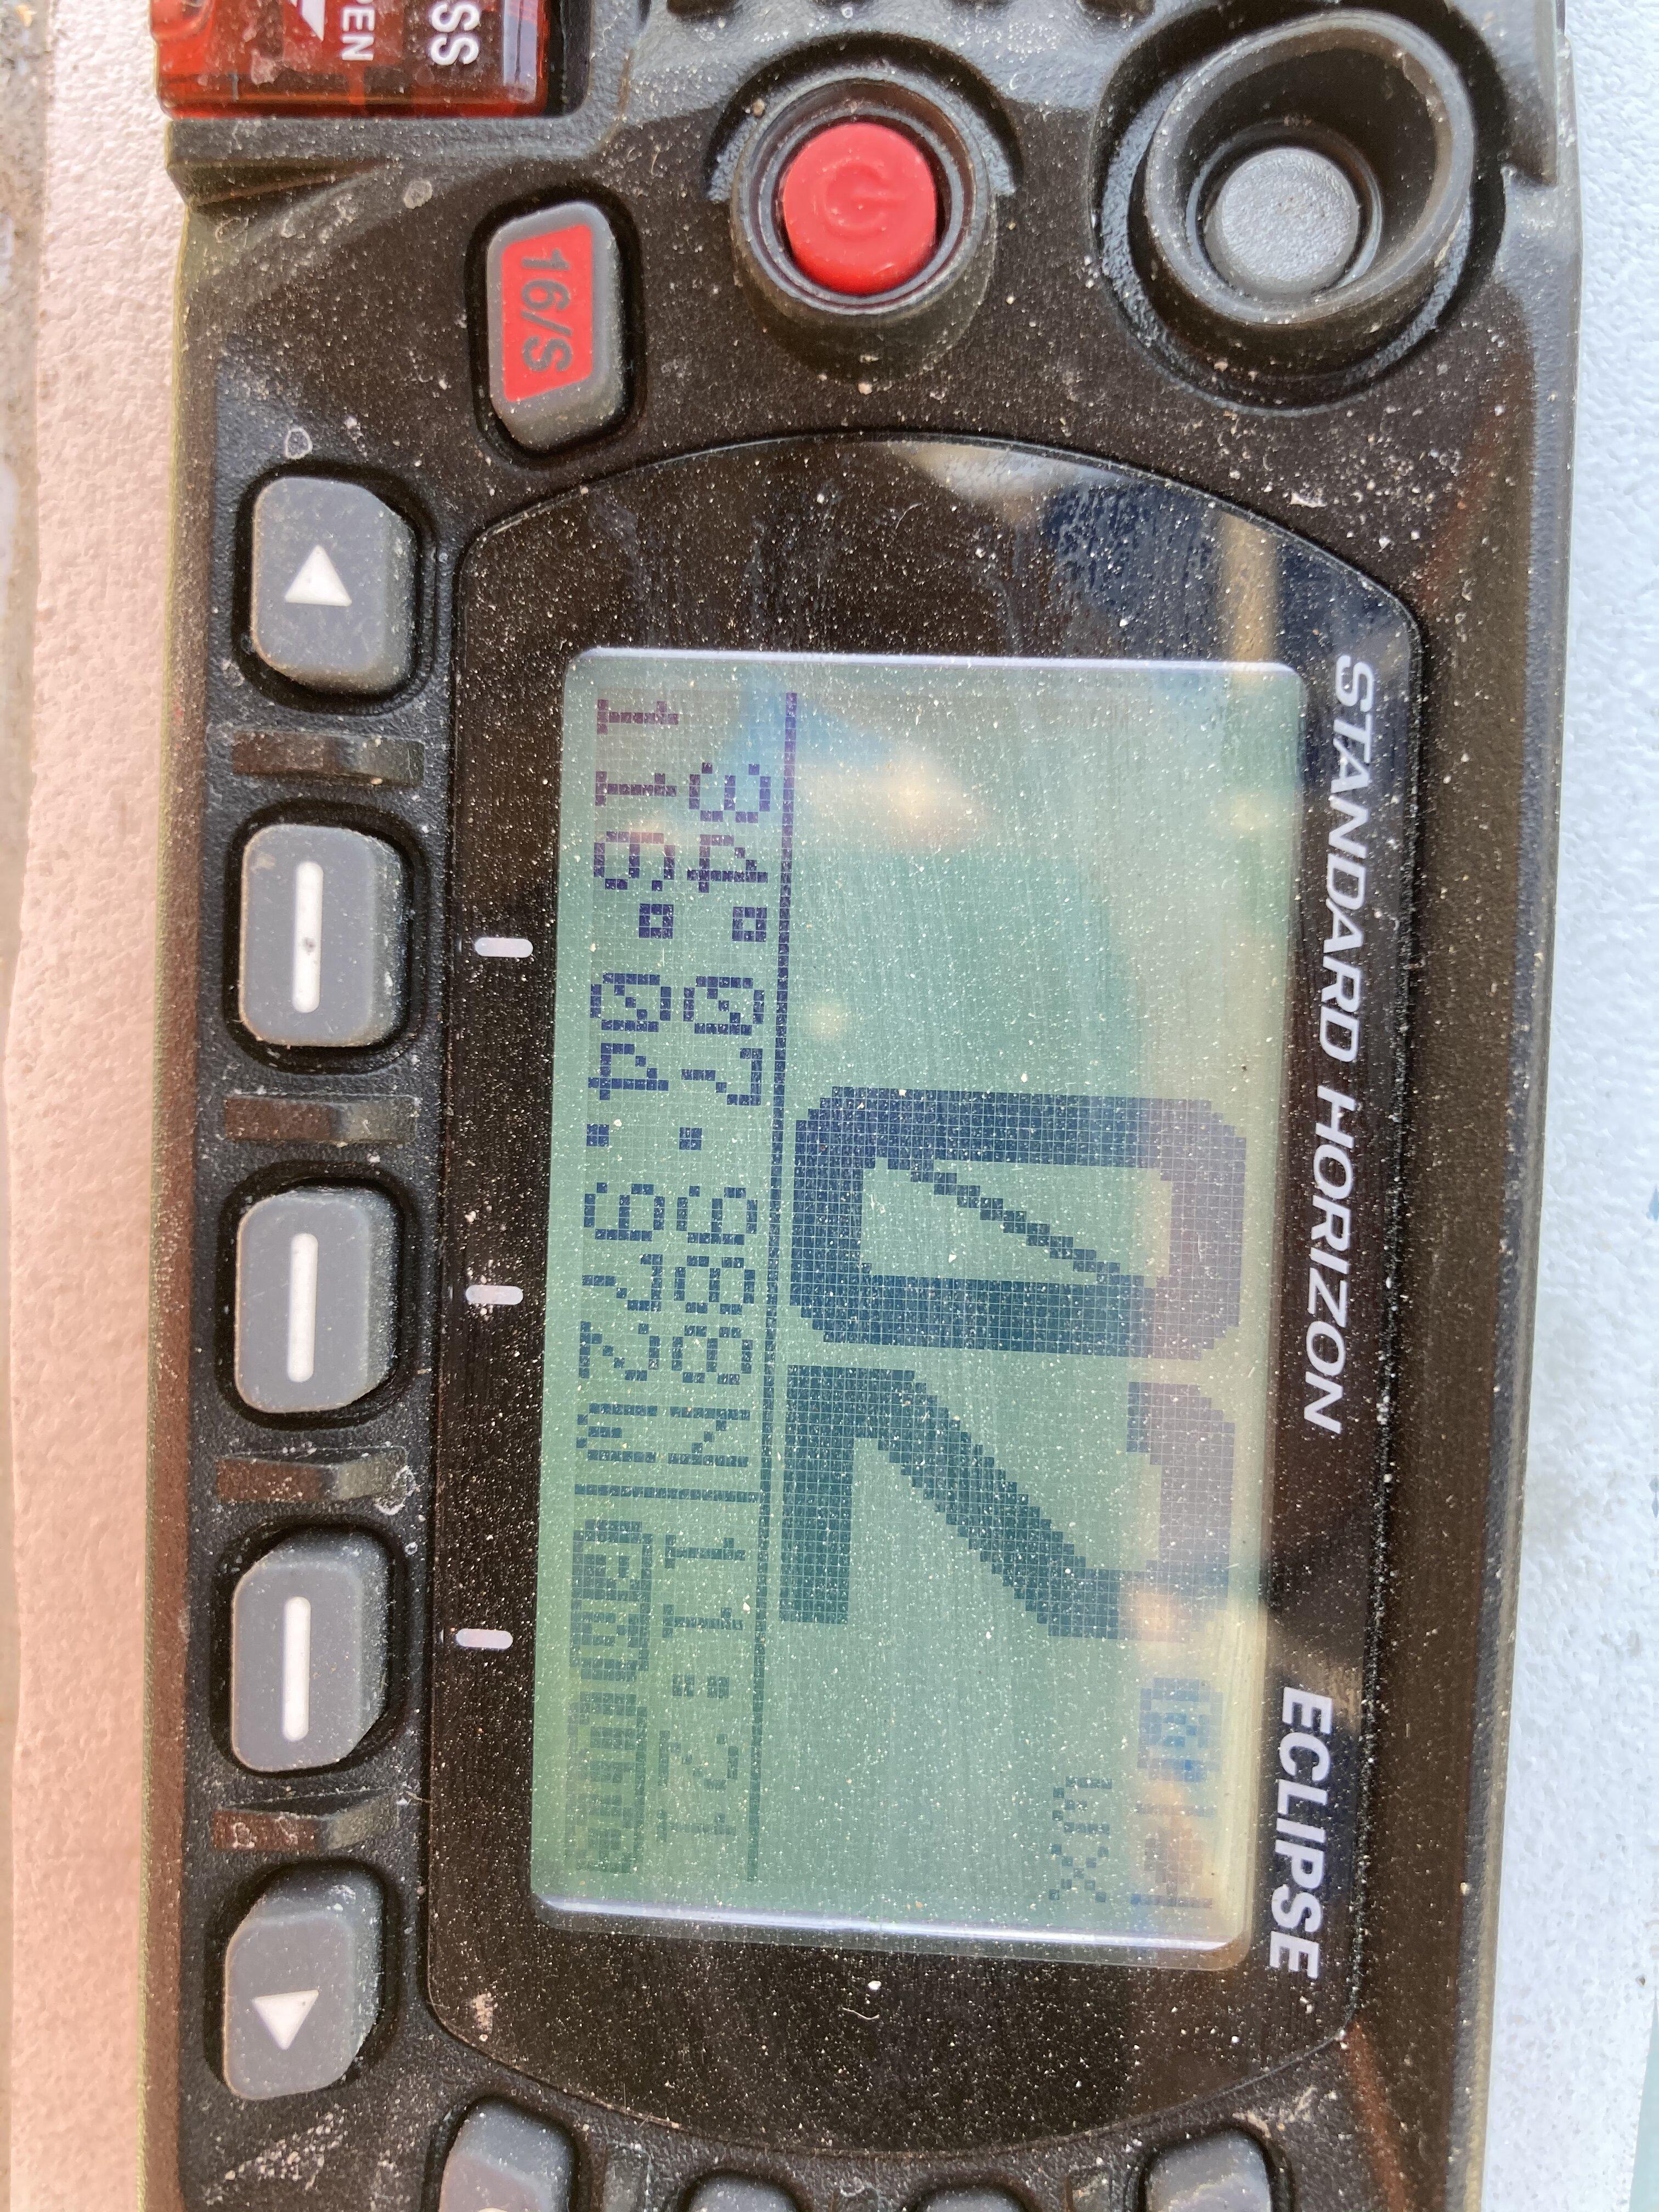 7690A697-FA3B-4F9E-BEC8-6D83A00C6006.jpeg